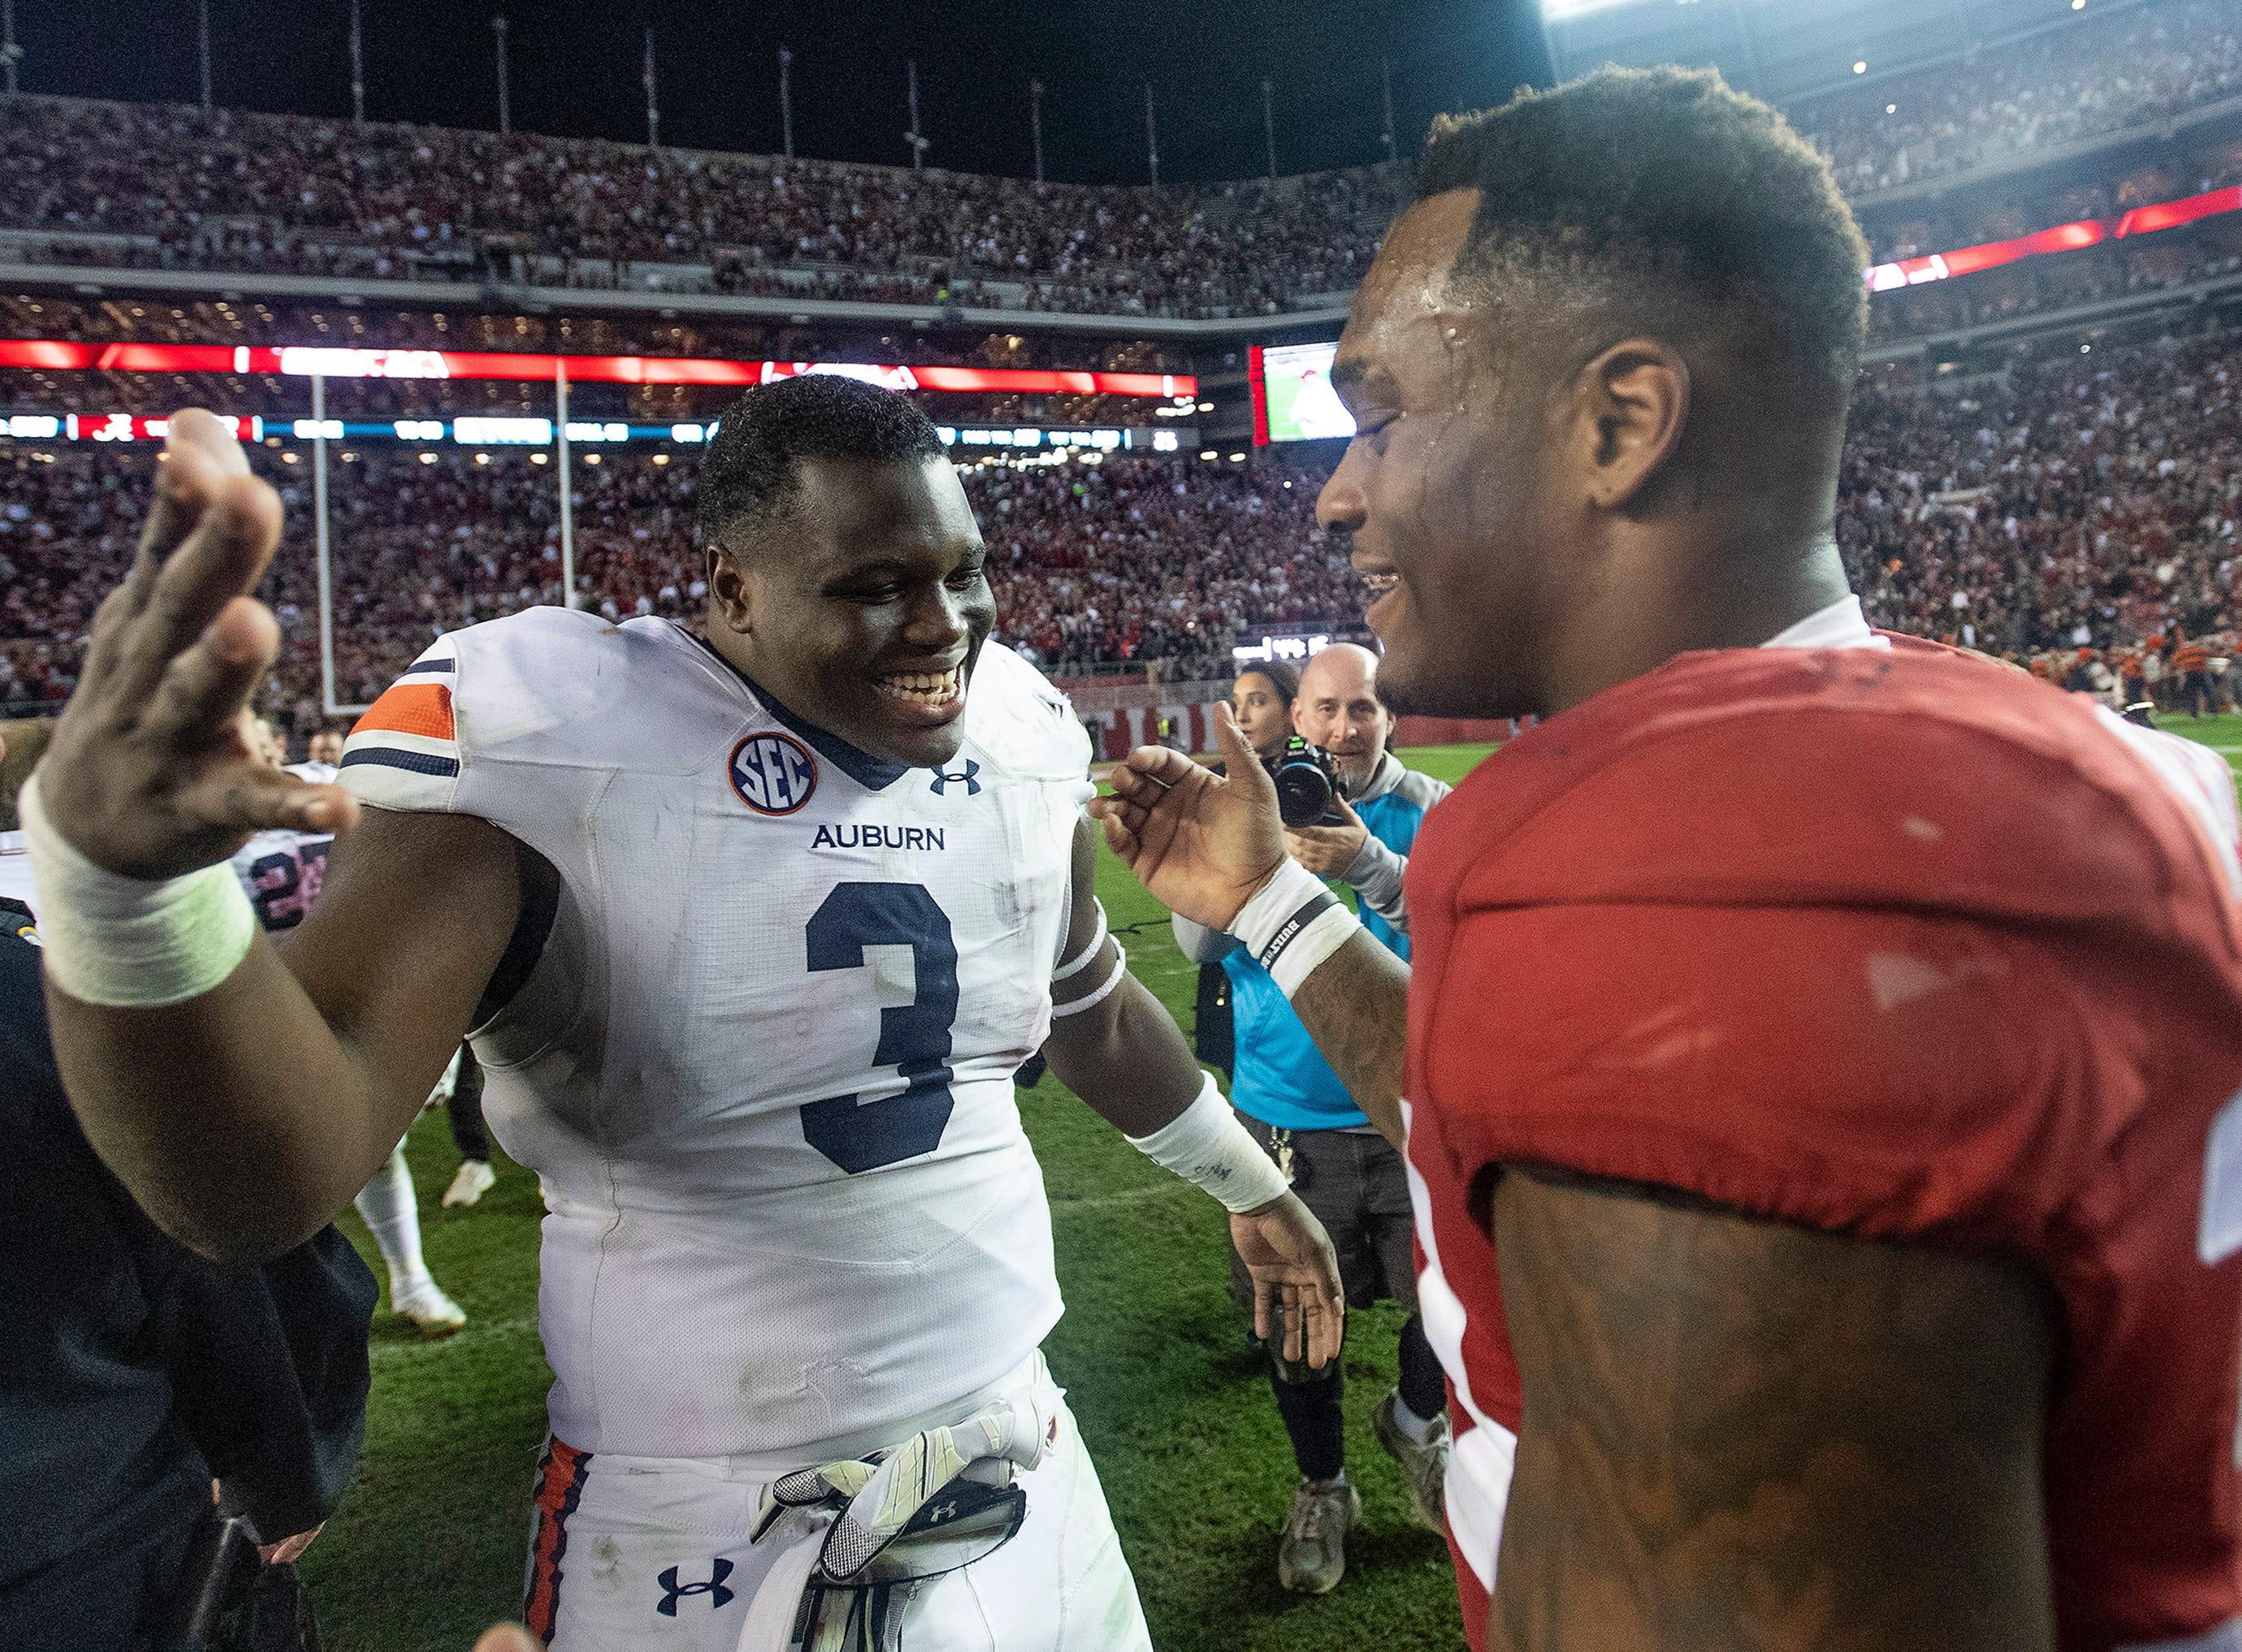 Alabama linebacker Mack Wilson (30) and Auburn defensive lineman Marlon Davidson (3) greet each other after the Iron Bowl at Bryant-Denny Stadium in Tuscaloosa, Ala., on Saturday November 24, 2018.